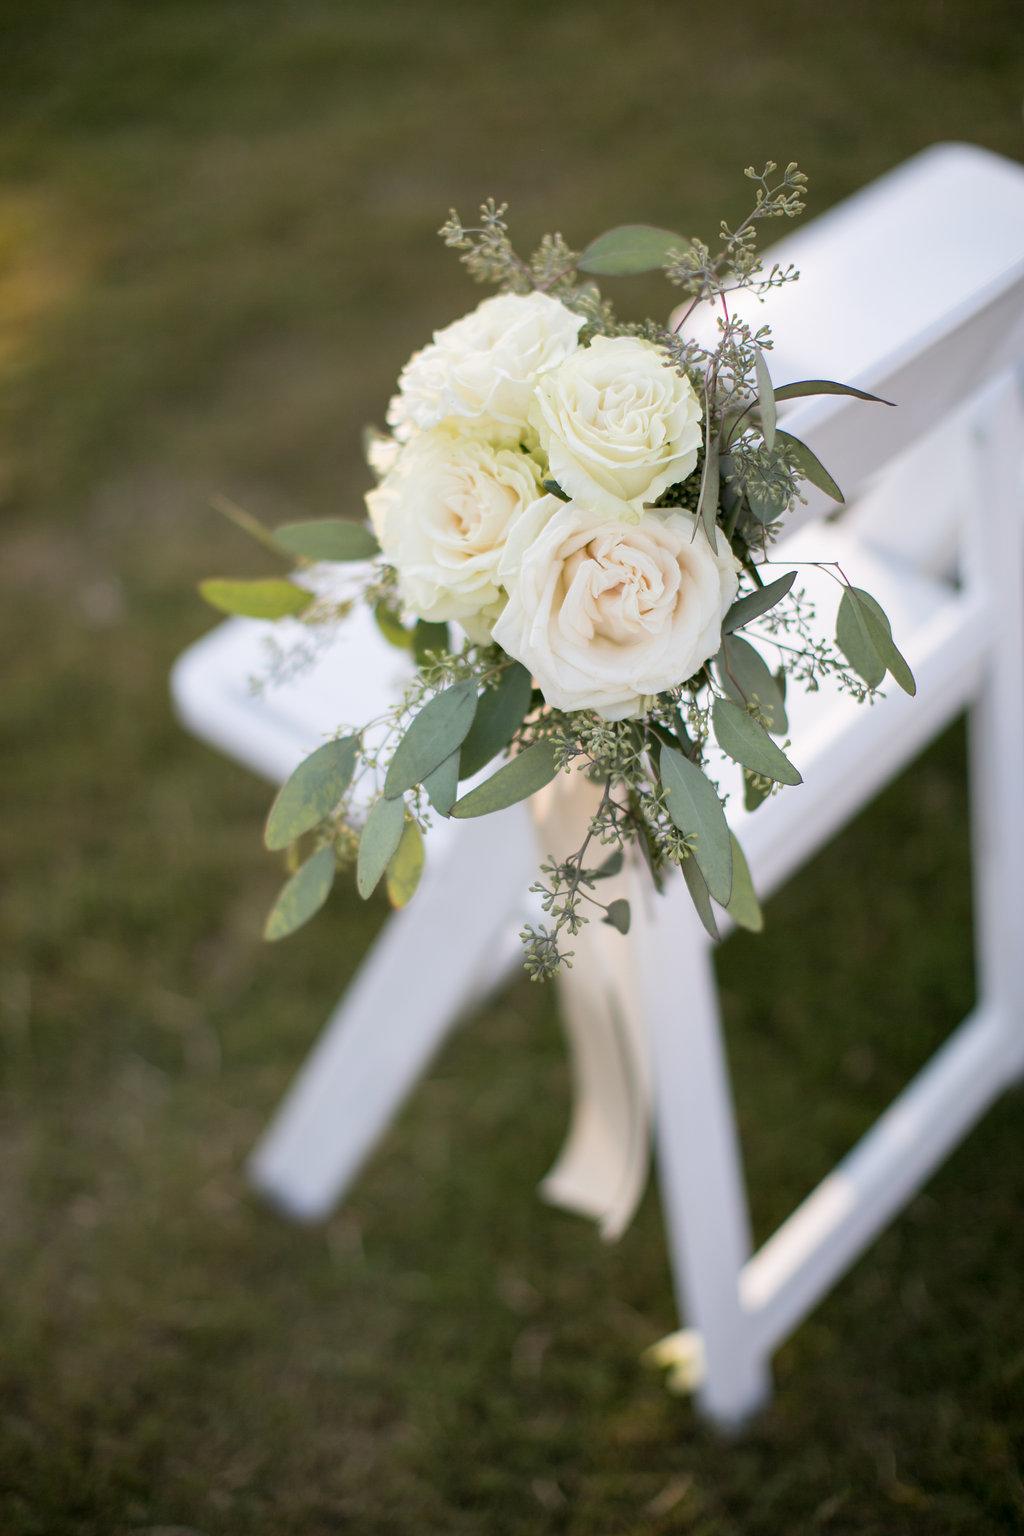 Foxhall-Resort-Wedding-Floral-Design-15.jpg